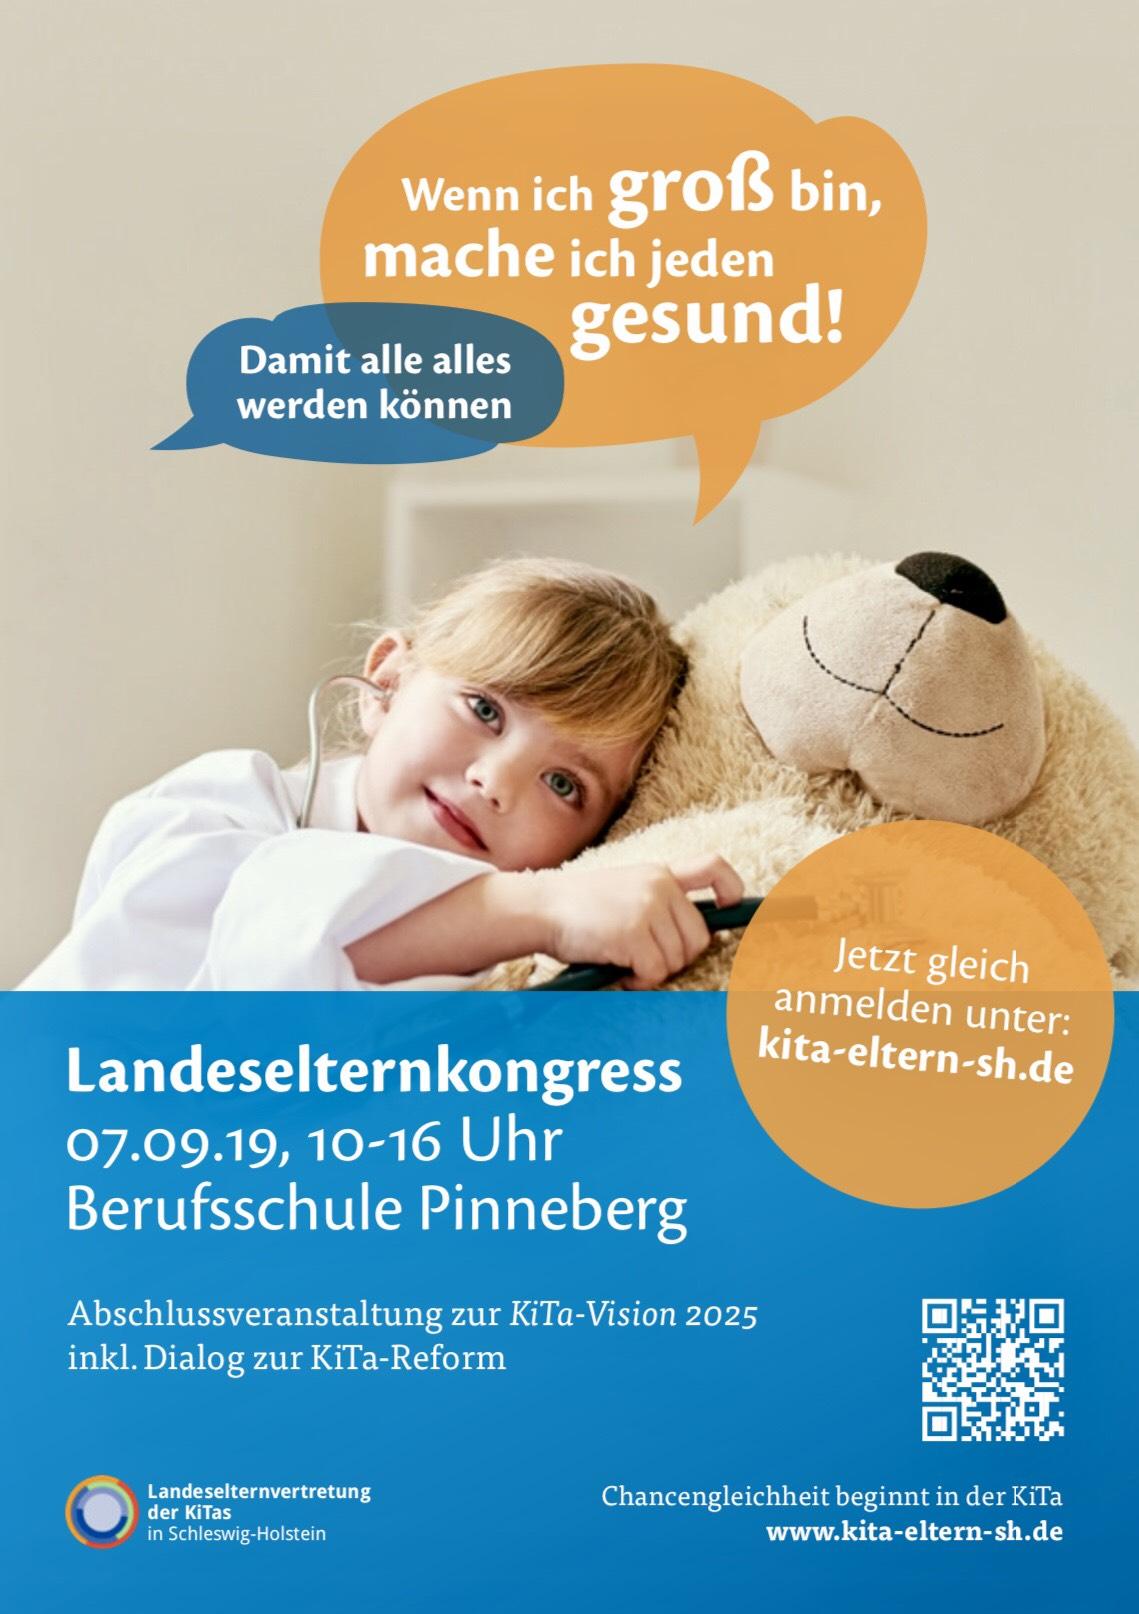 Freie-Demokraten-FDP-Stadtverband-Wedel-Soziales-Kita-Landeselternkongress-Plakat